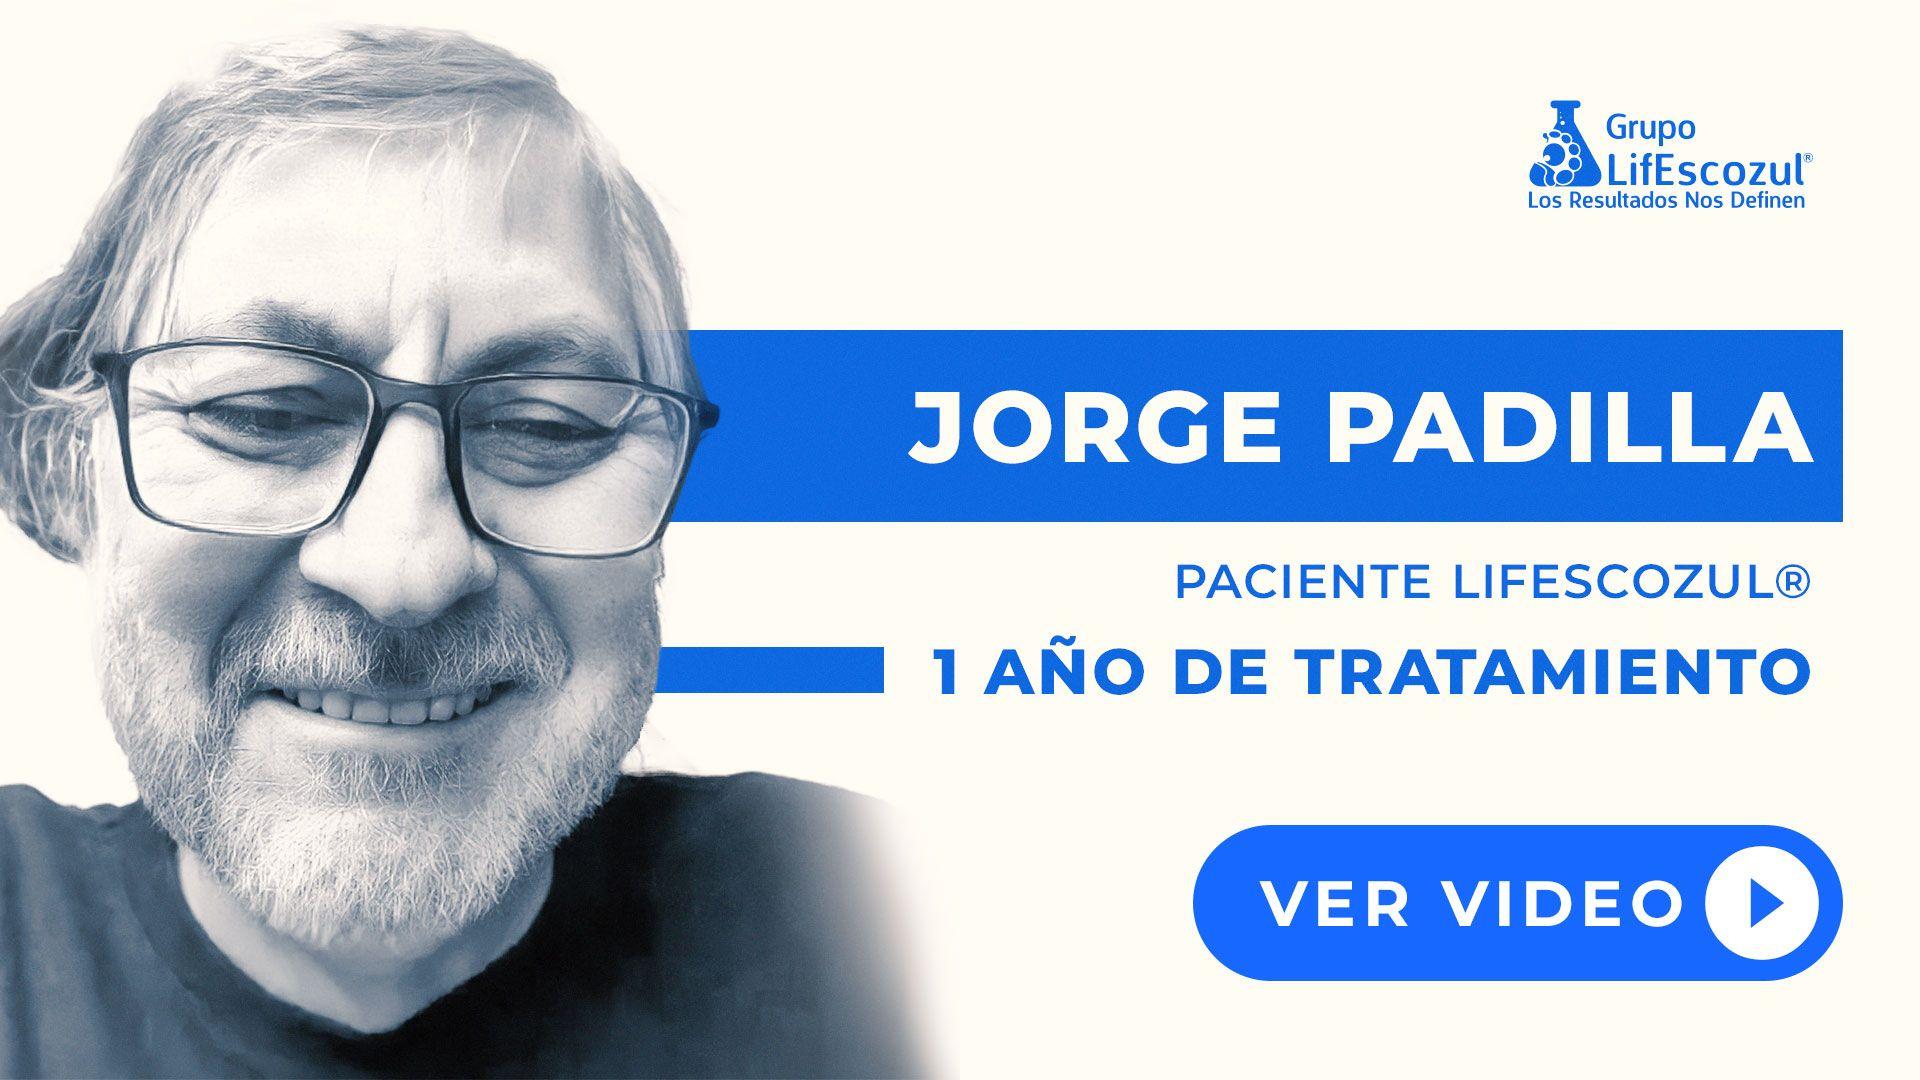 Jorge Padilla - Cáncer de Páncreas - Resultados con LifEscozul®